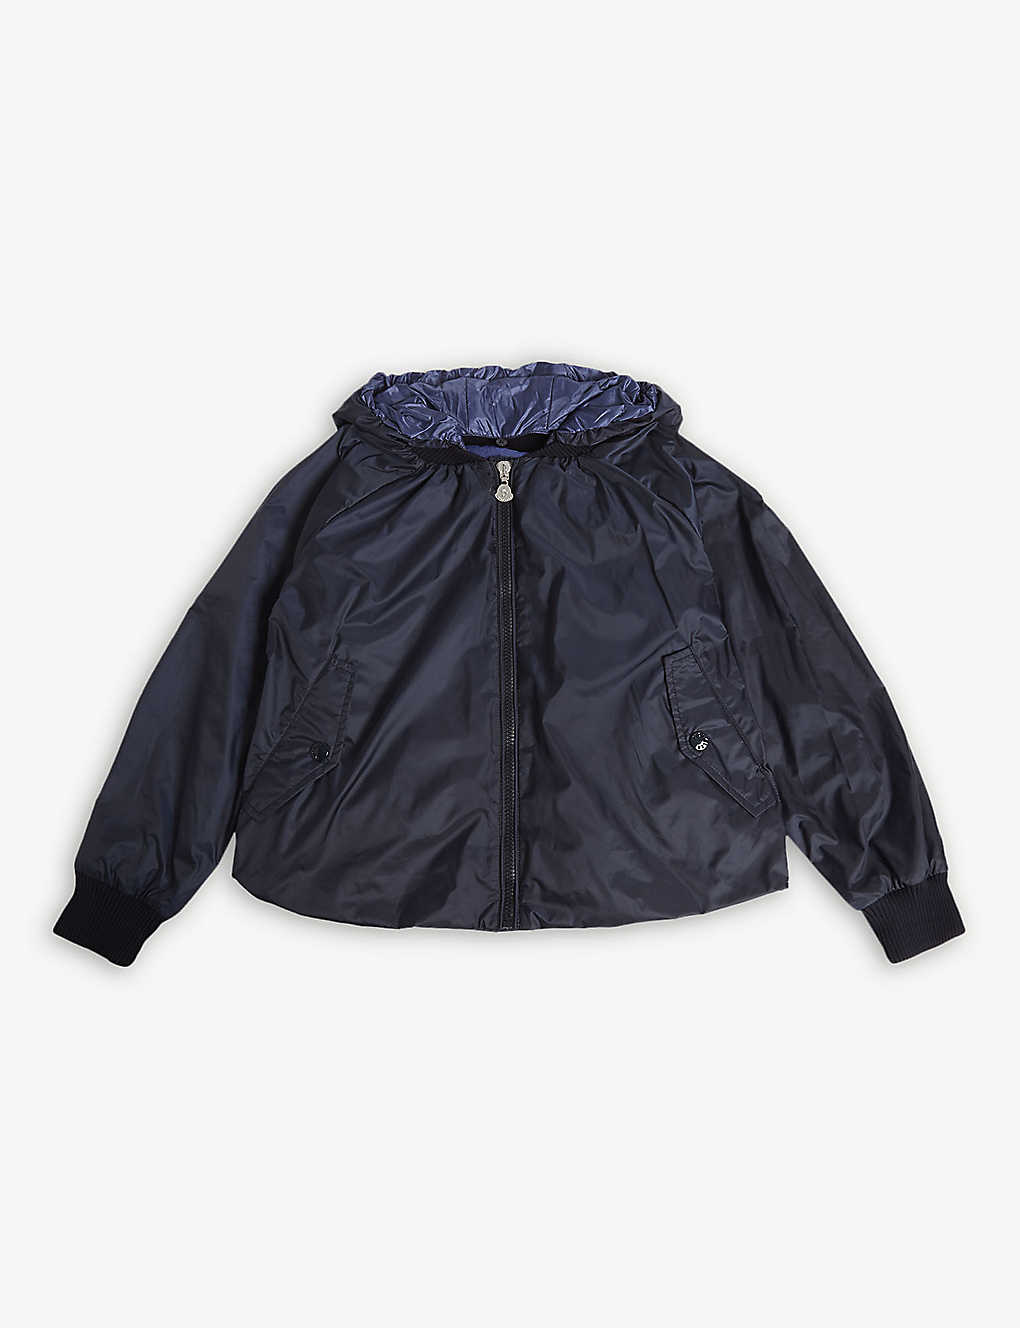 15910c49c MONCLER - Amman jacket with detachable hood 4-14 years | Selfridges.com